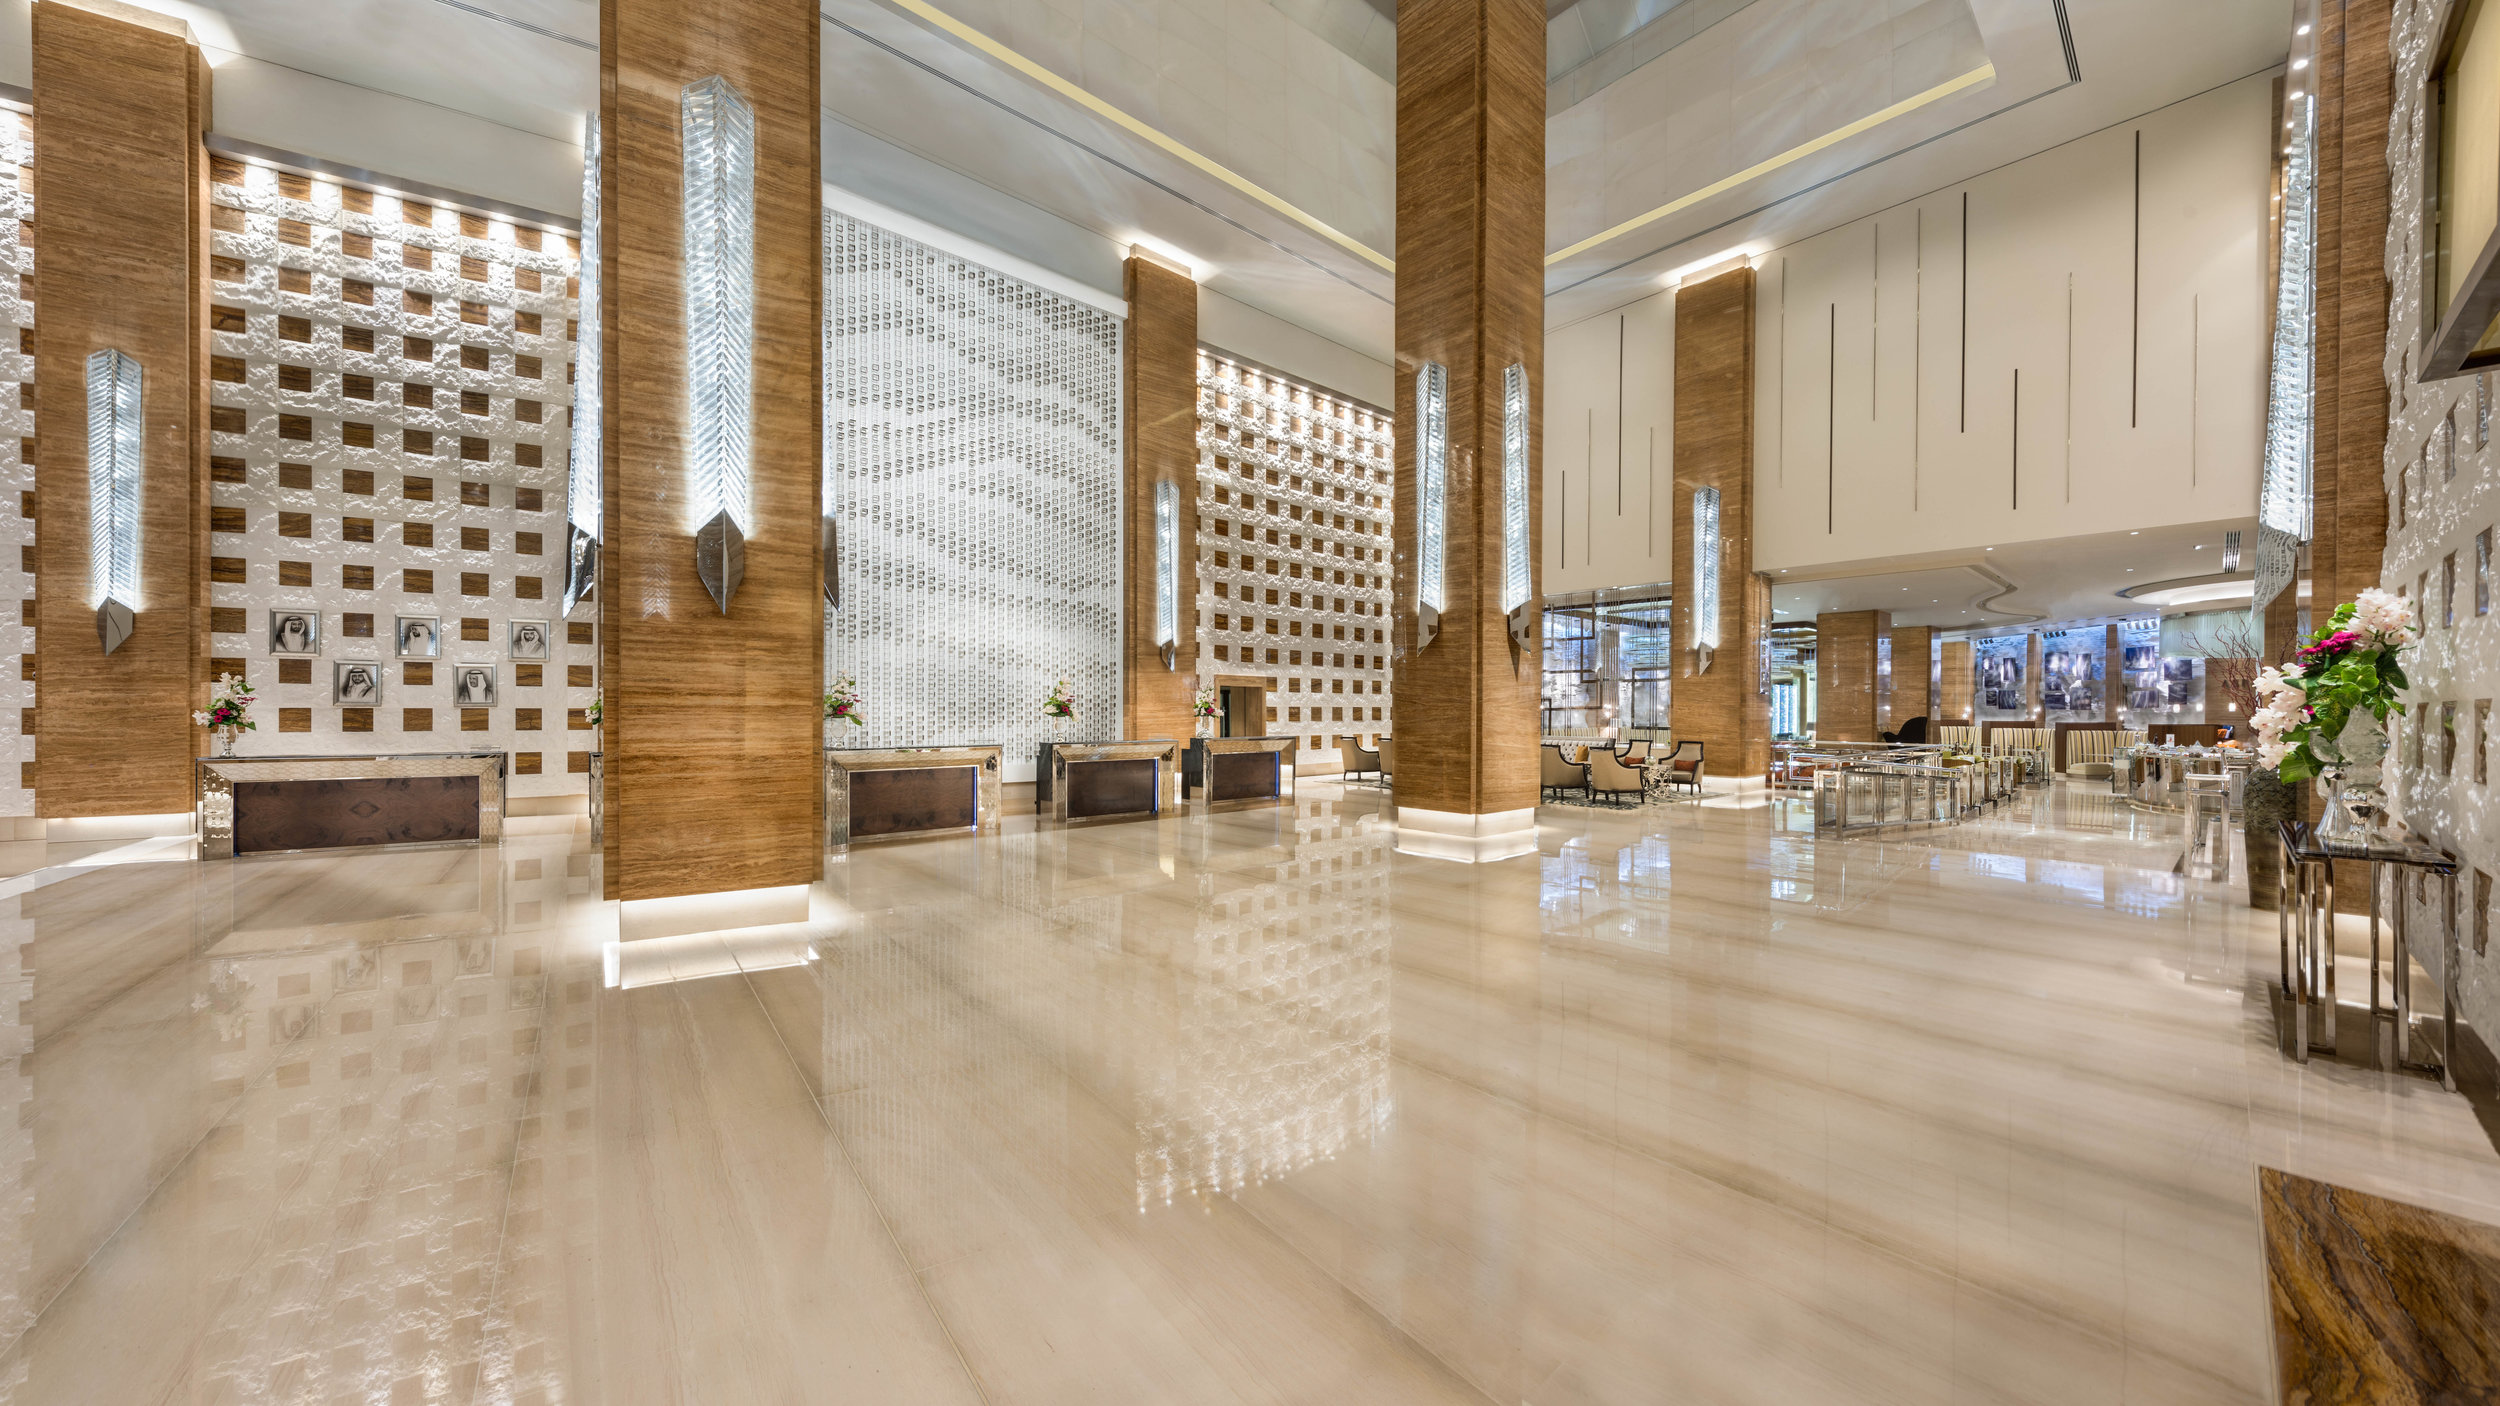 Kempinski Hotel Mall of the Emirates Dubai 3.jpg